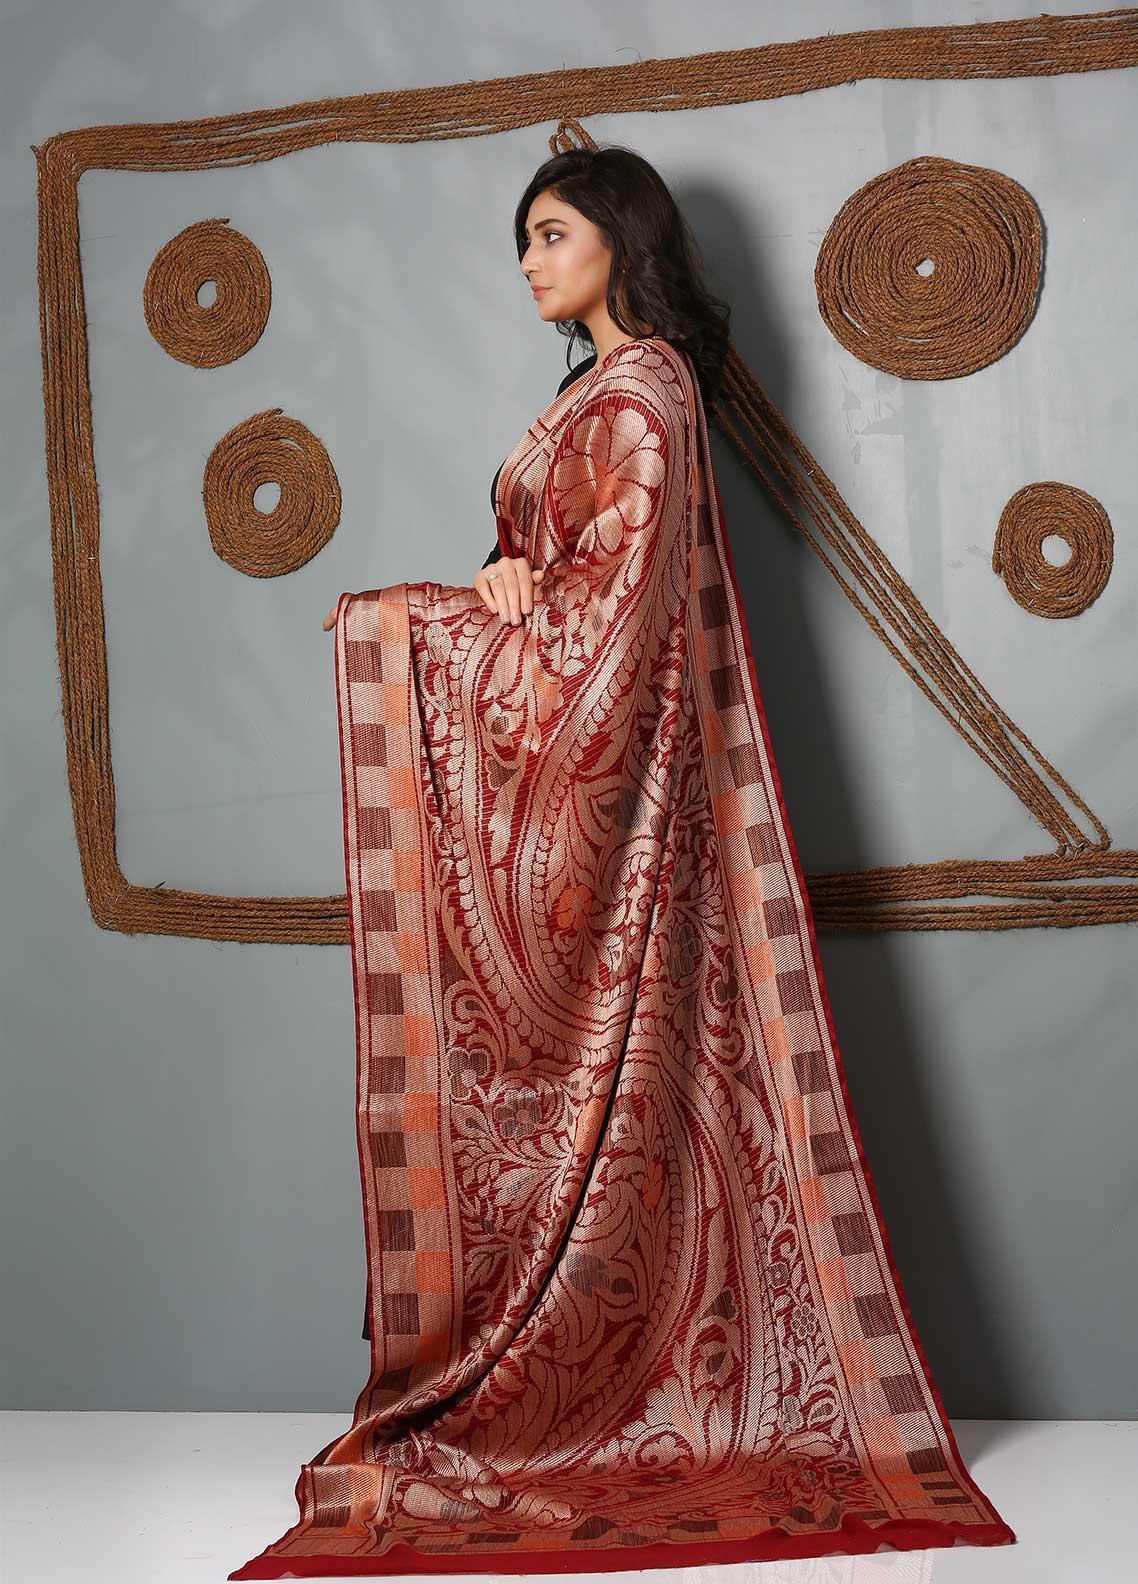 Al Rahim Banarsi Embroidered Banarsi  Shawl AR21BS ALF53 Red - Banarsi Shawls